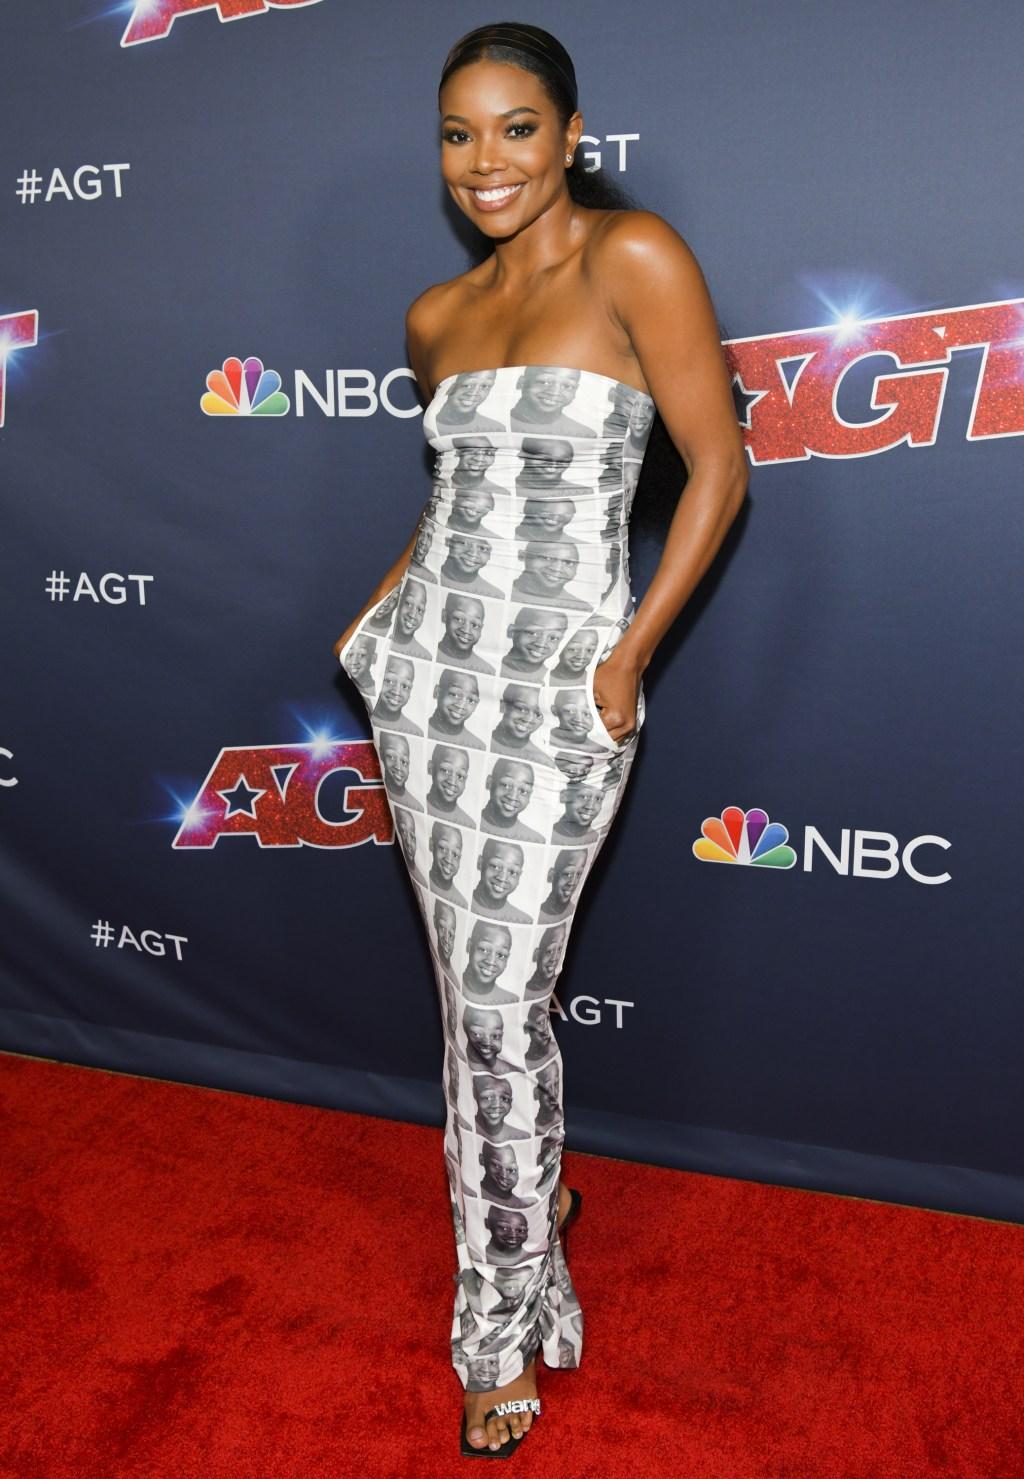 Gabrielle Union, America's Got Talent